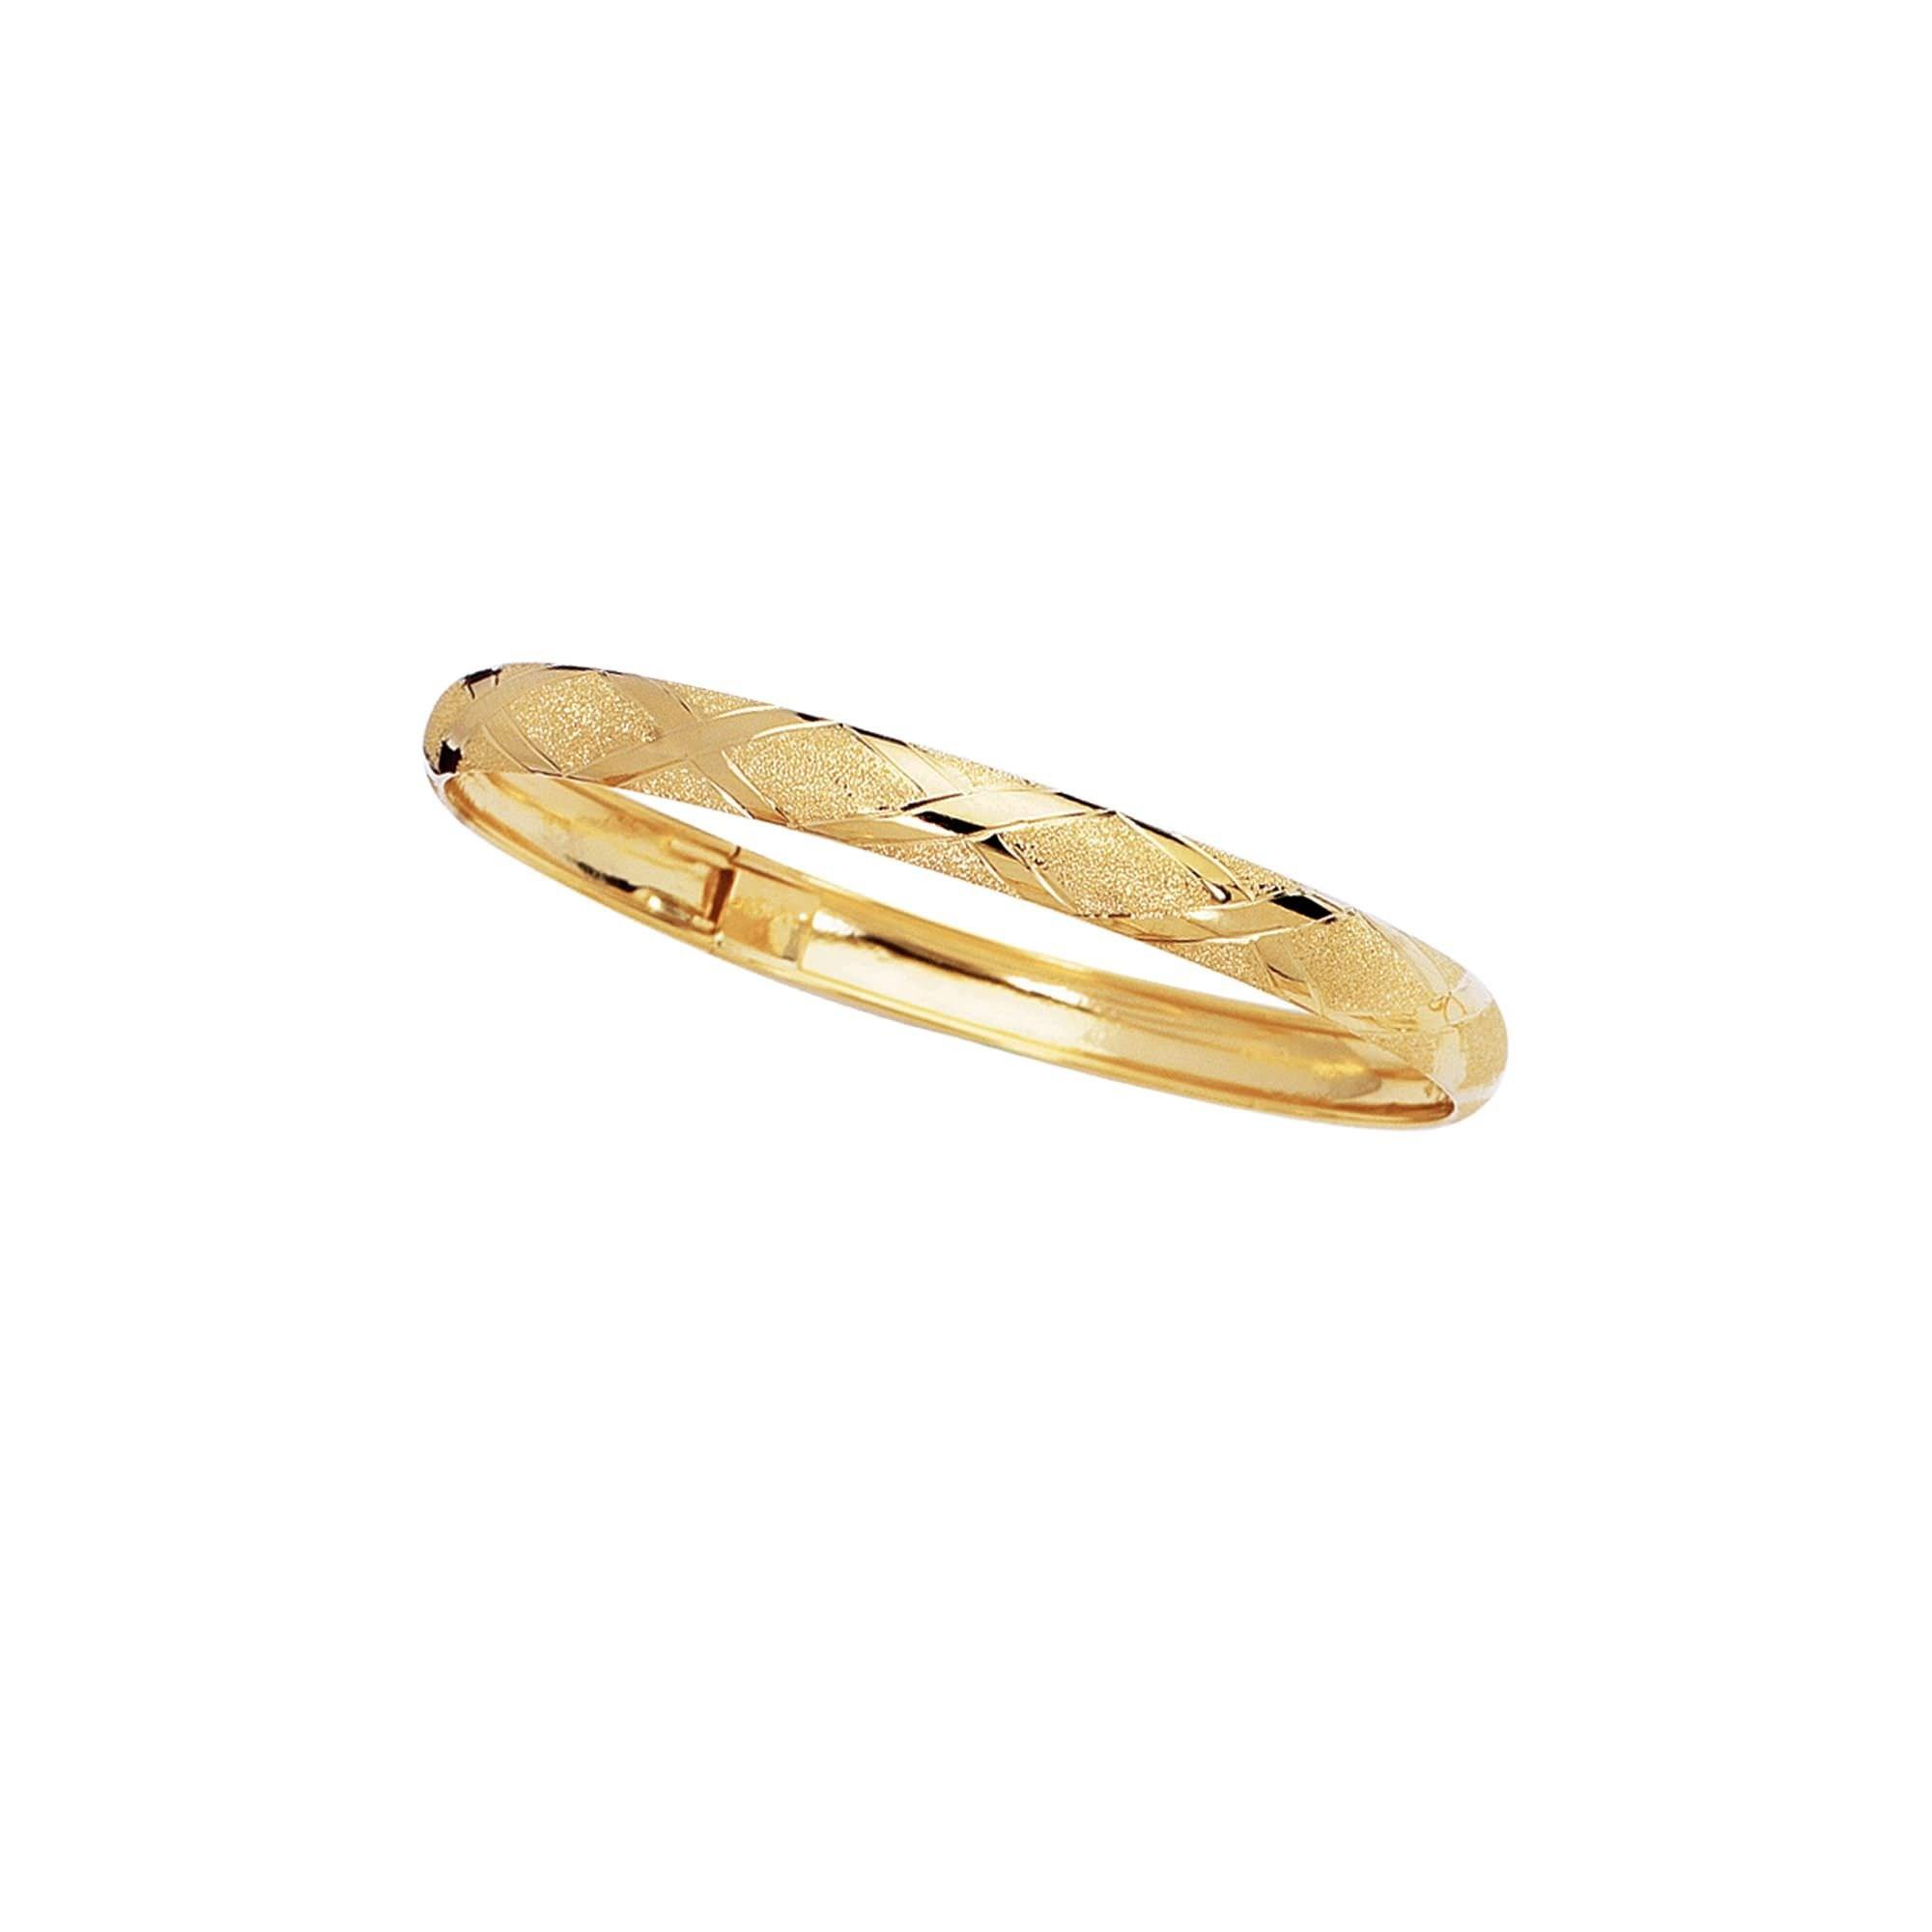 10K 8'' Yellow Gold 6.0mm Shiny Textured Flex Bangle with Diamond Shape Pattern